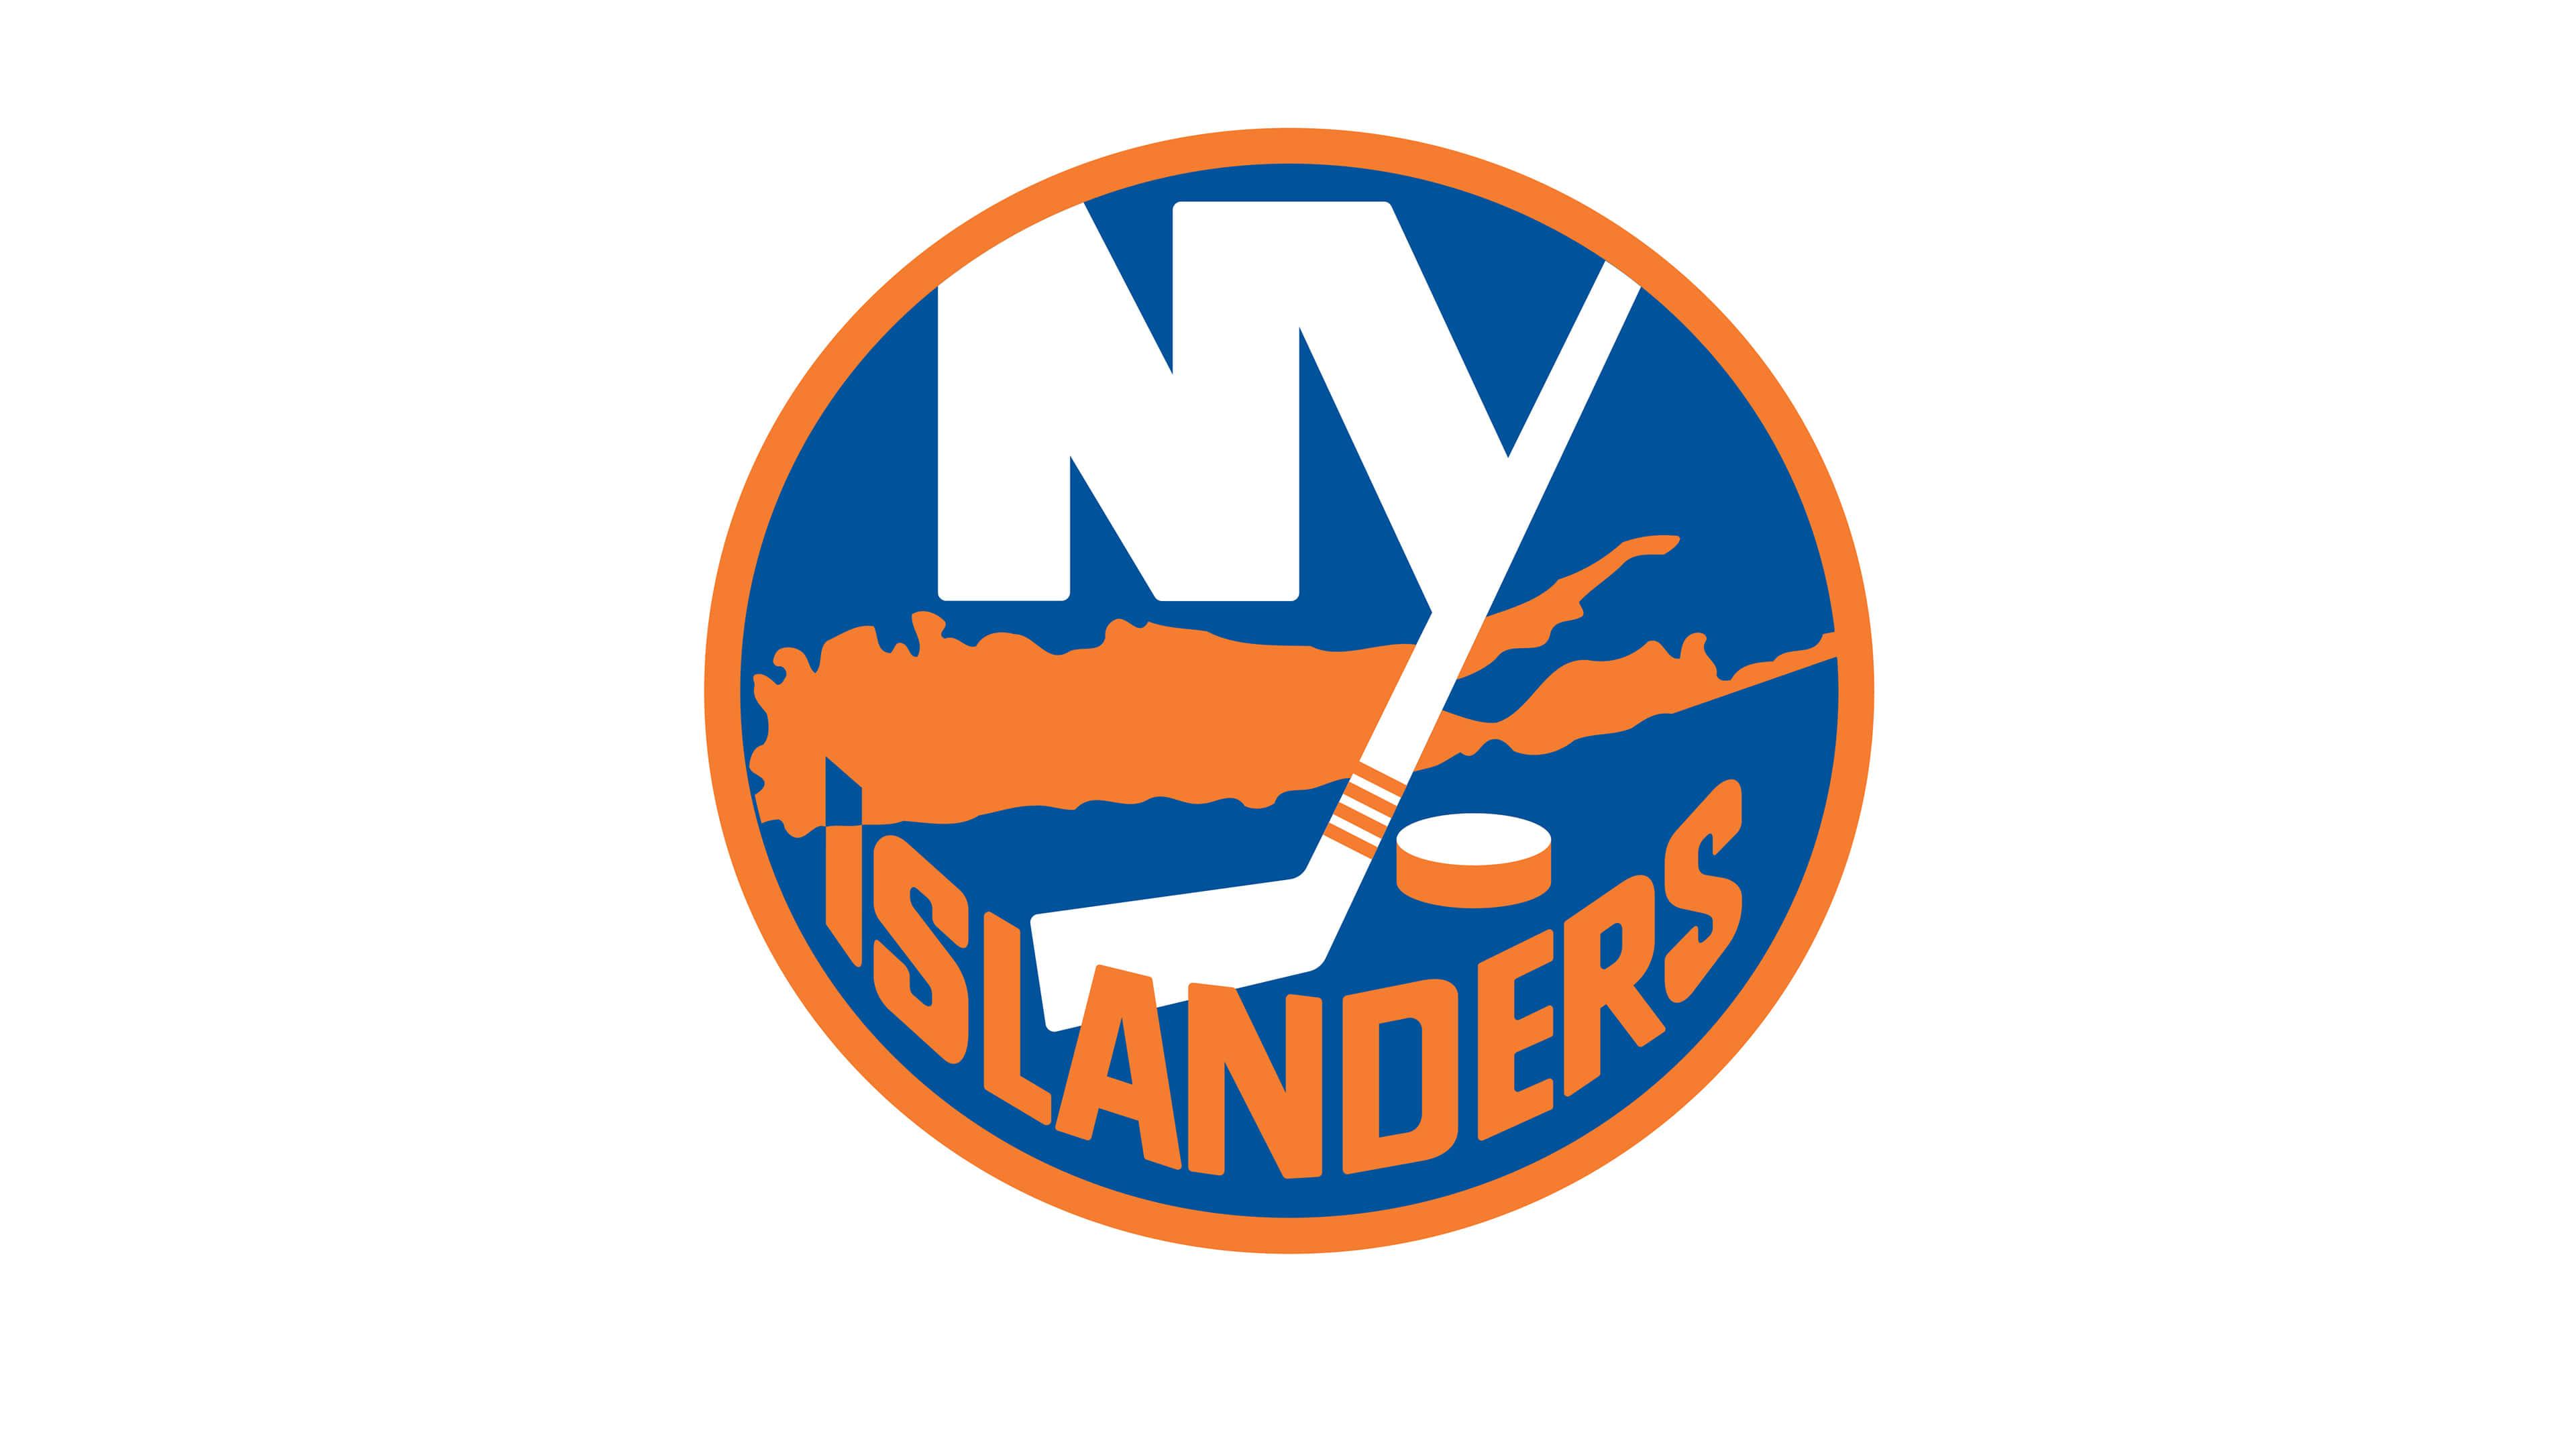 New York Islanders Nhl Logo Uhd 4k Wallpaper - New York Islanders Logo , HD Wallpaper & Backgrounds